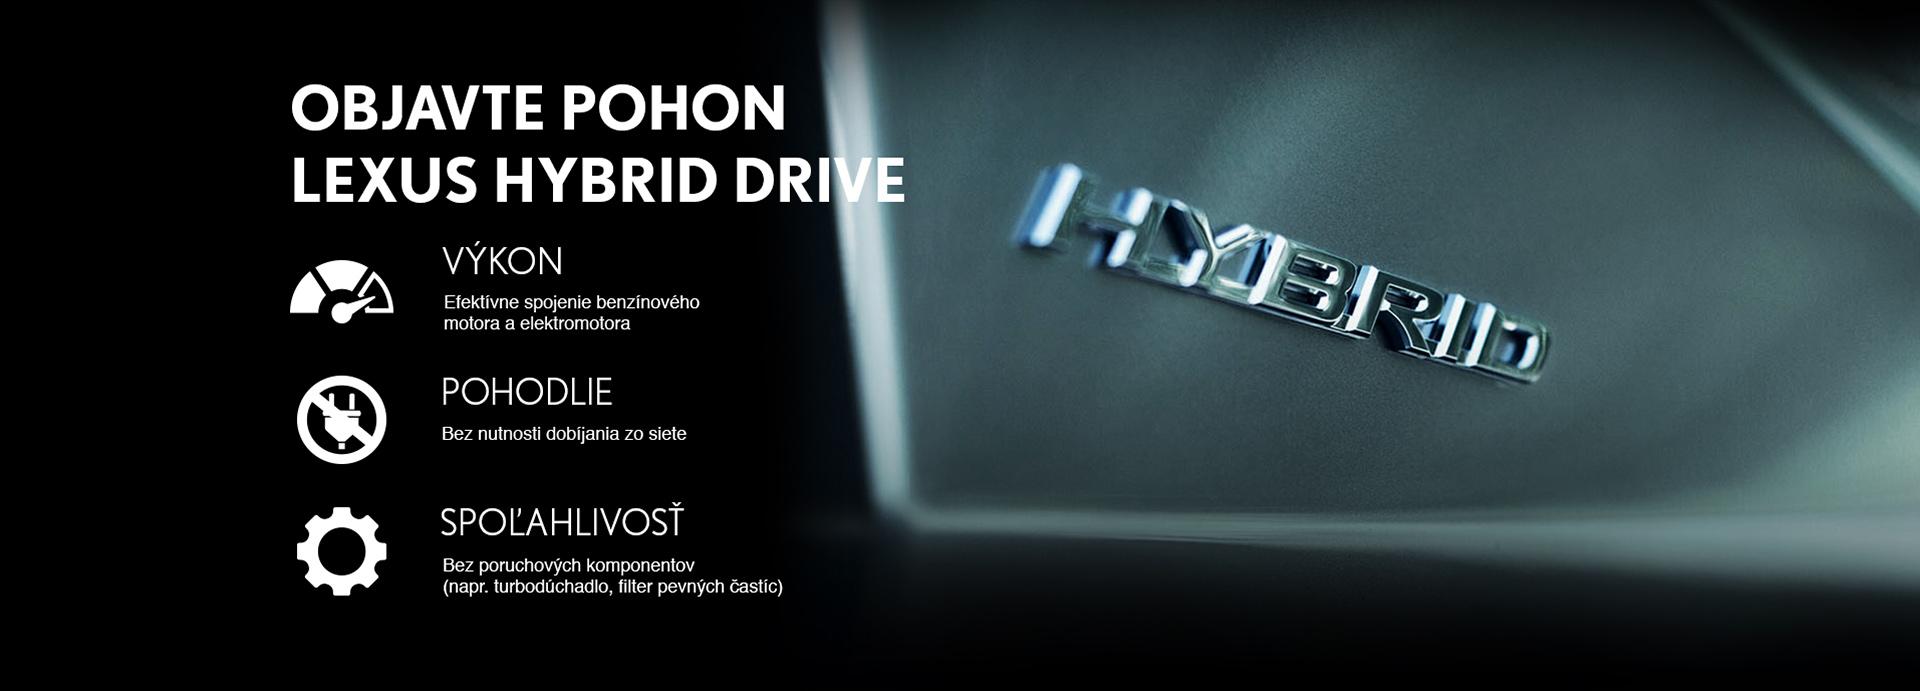 Hybrid Drive Image